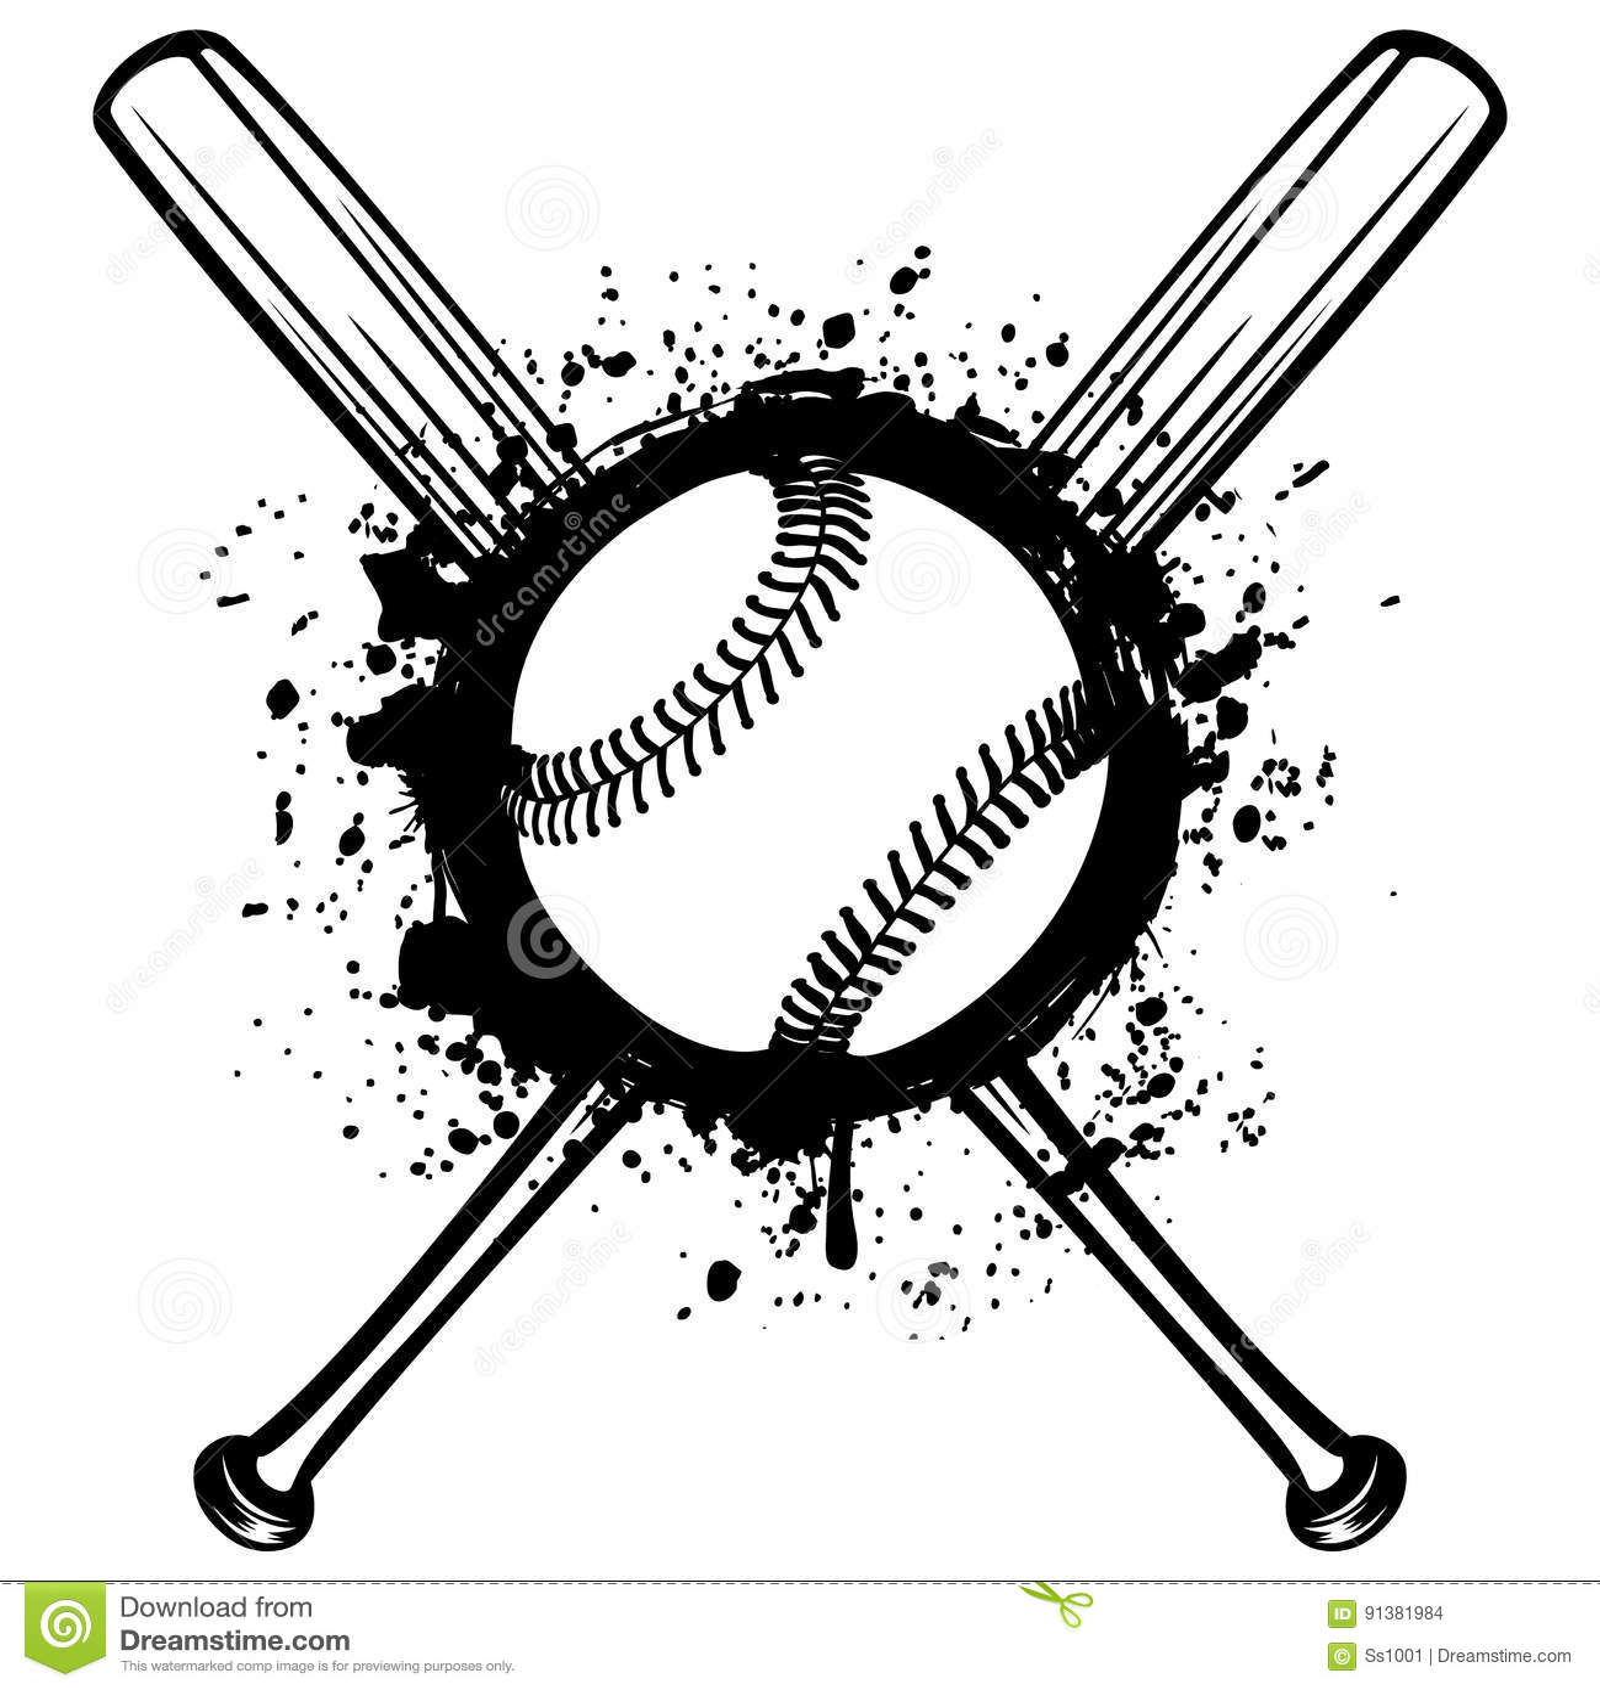 2 baseball